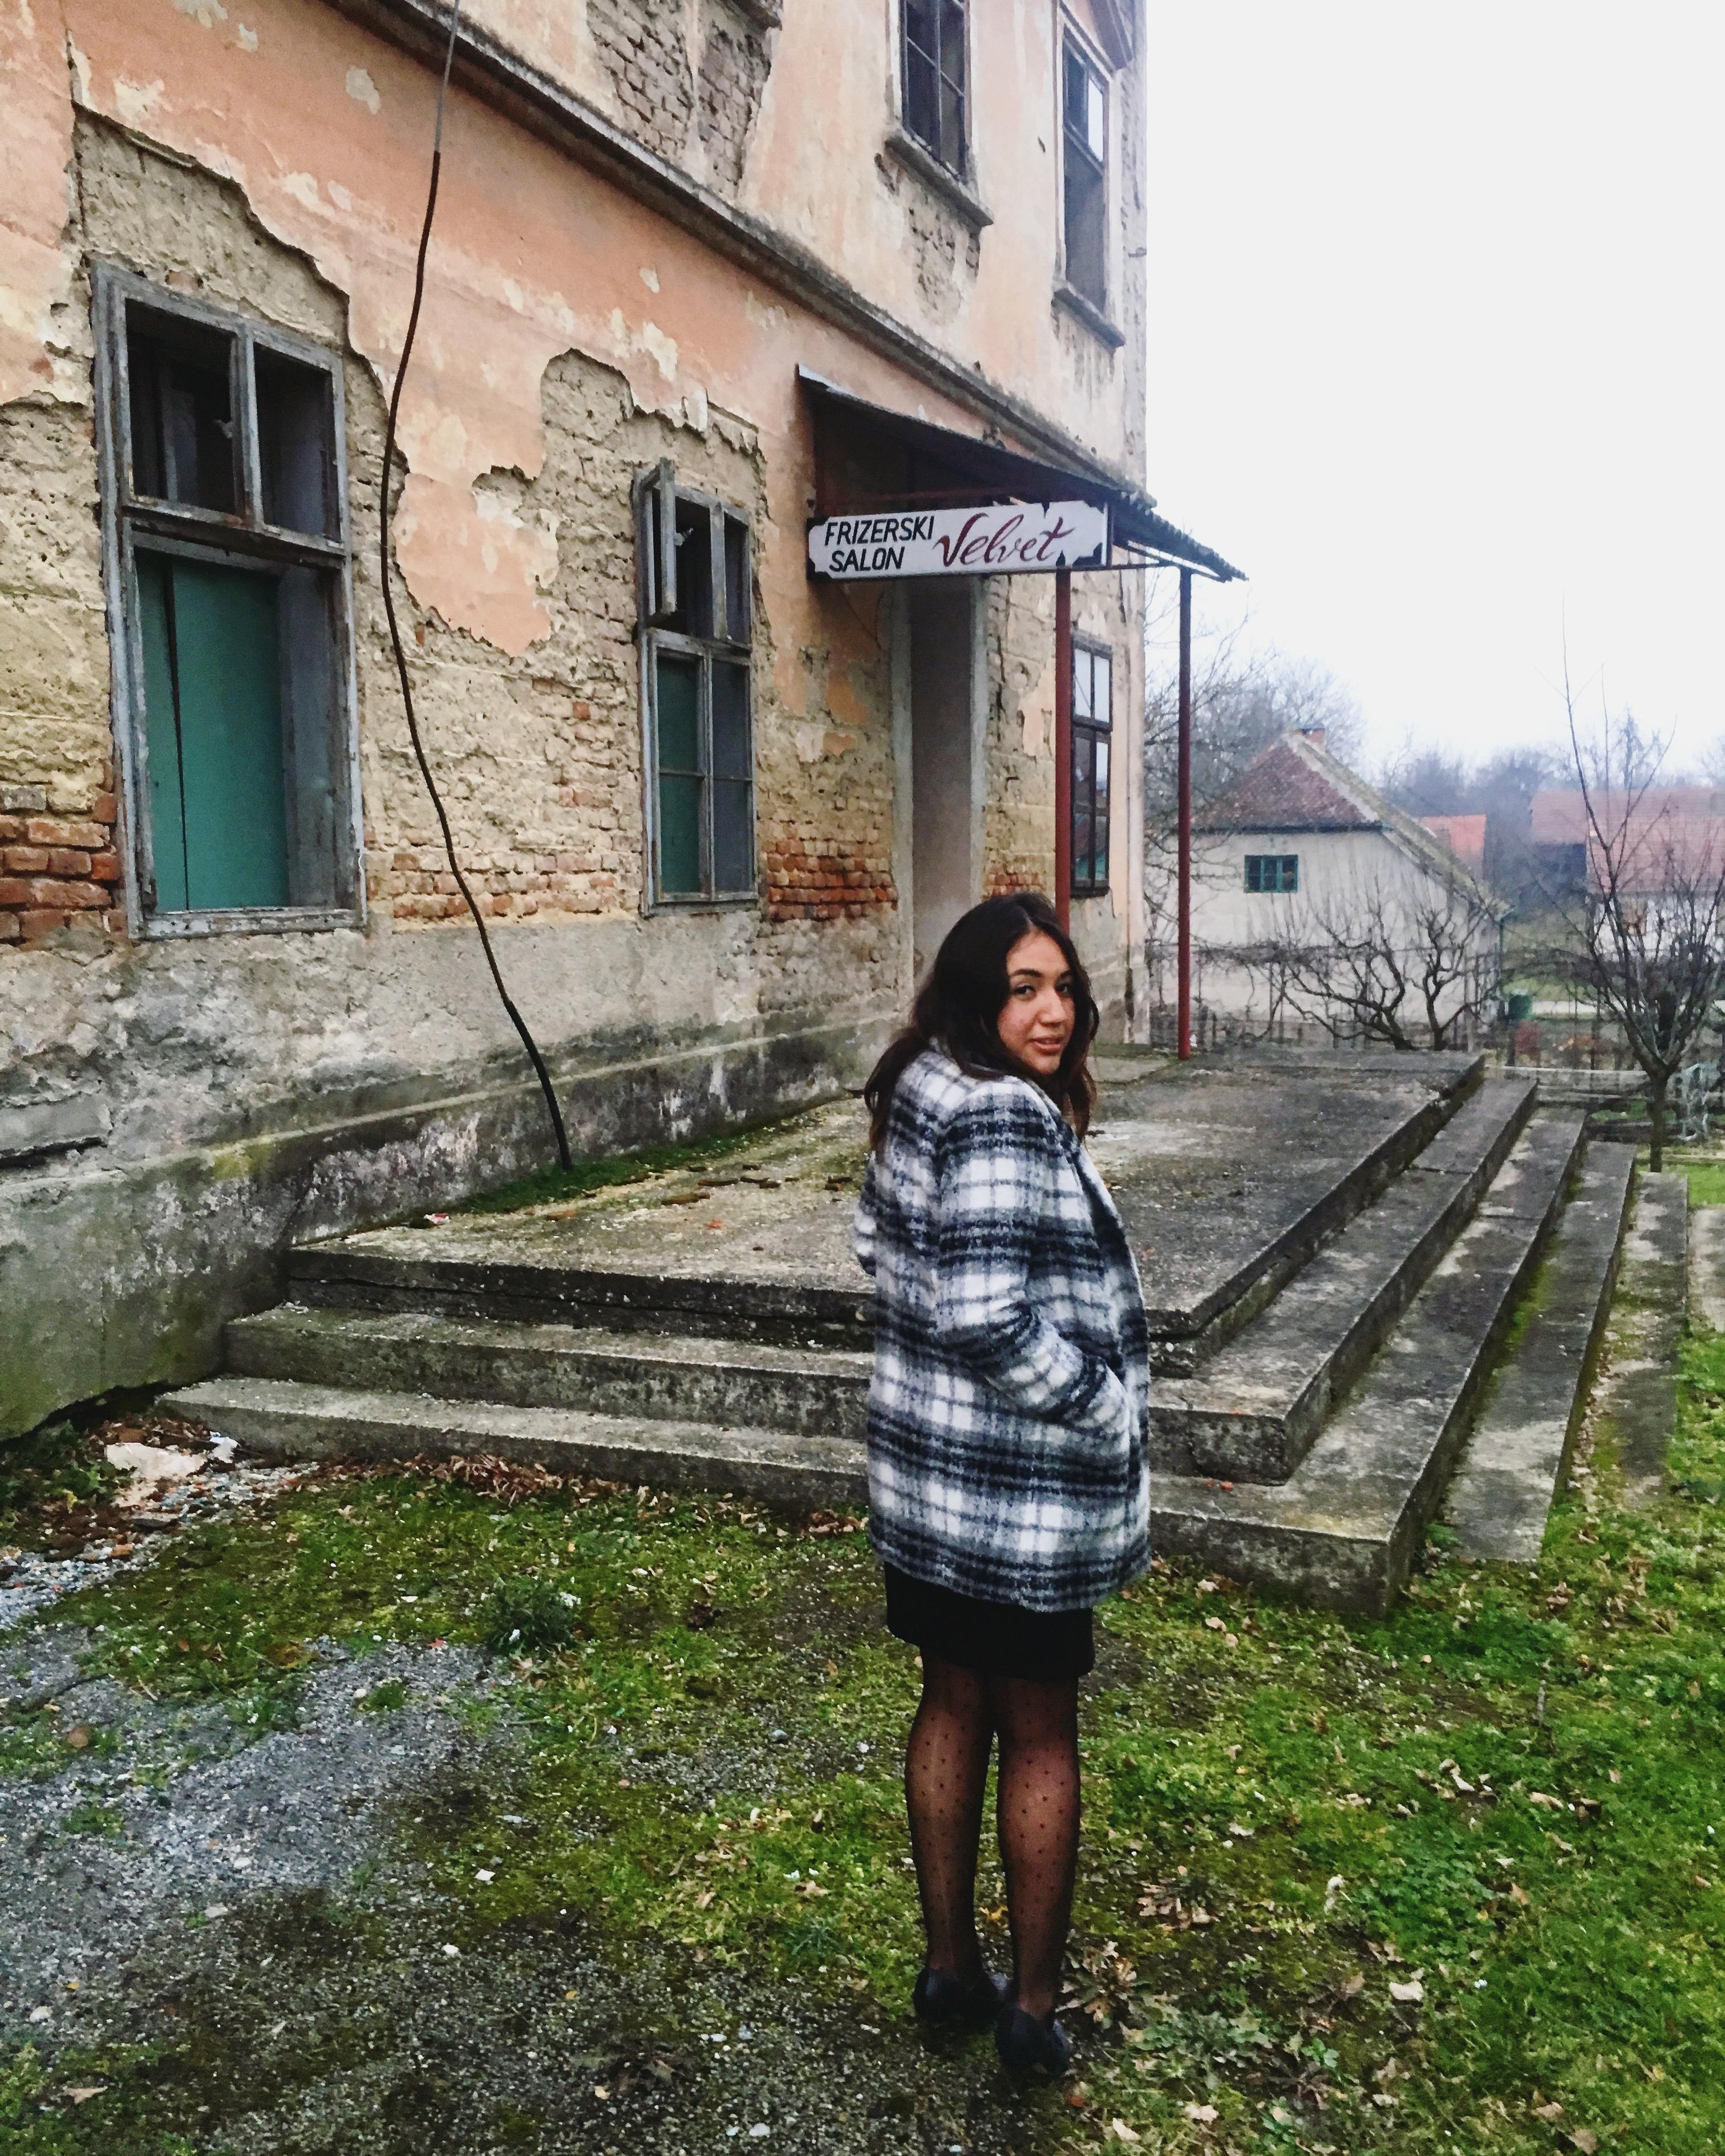 Pam in Croatia at a Funeral